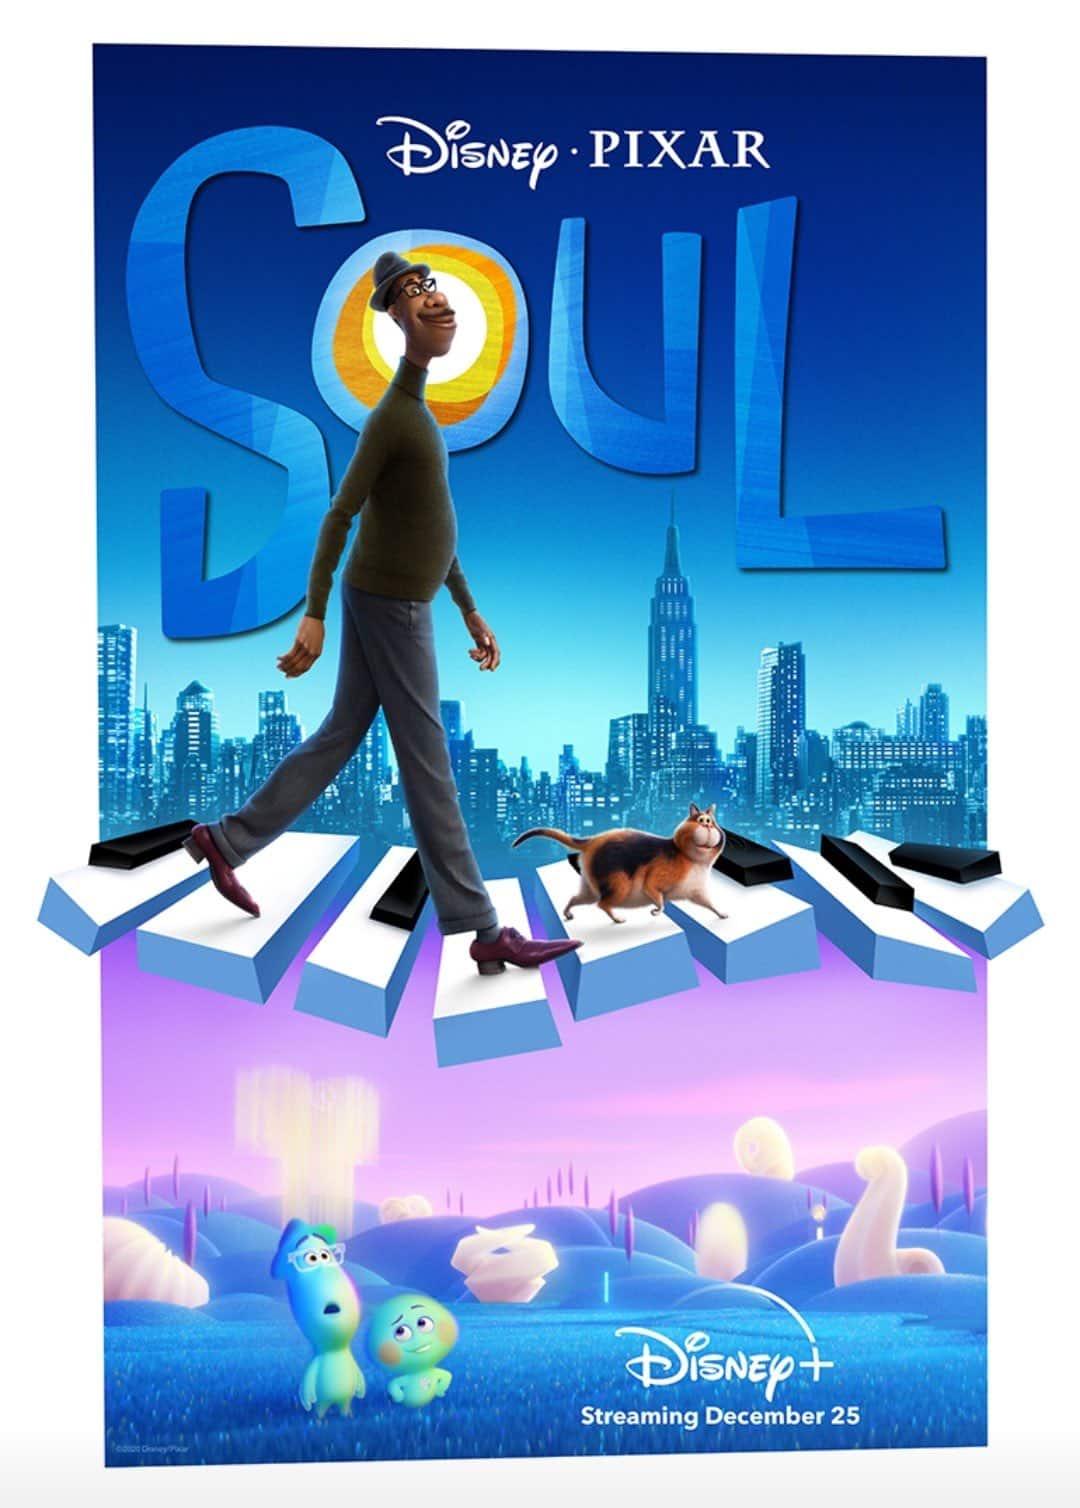 Soul [Pixar - 2020] - Page 6 7C59CDAD-41C7-4FEF-84E4-2AC5DCA6D1EE